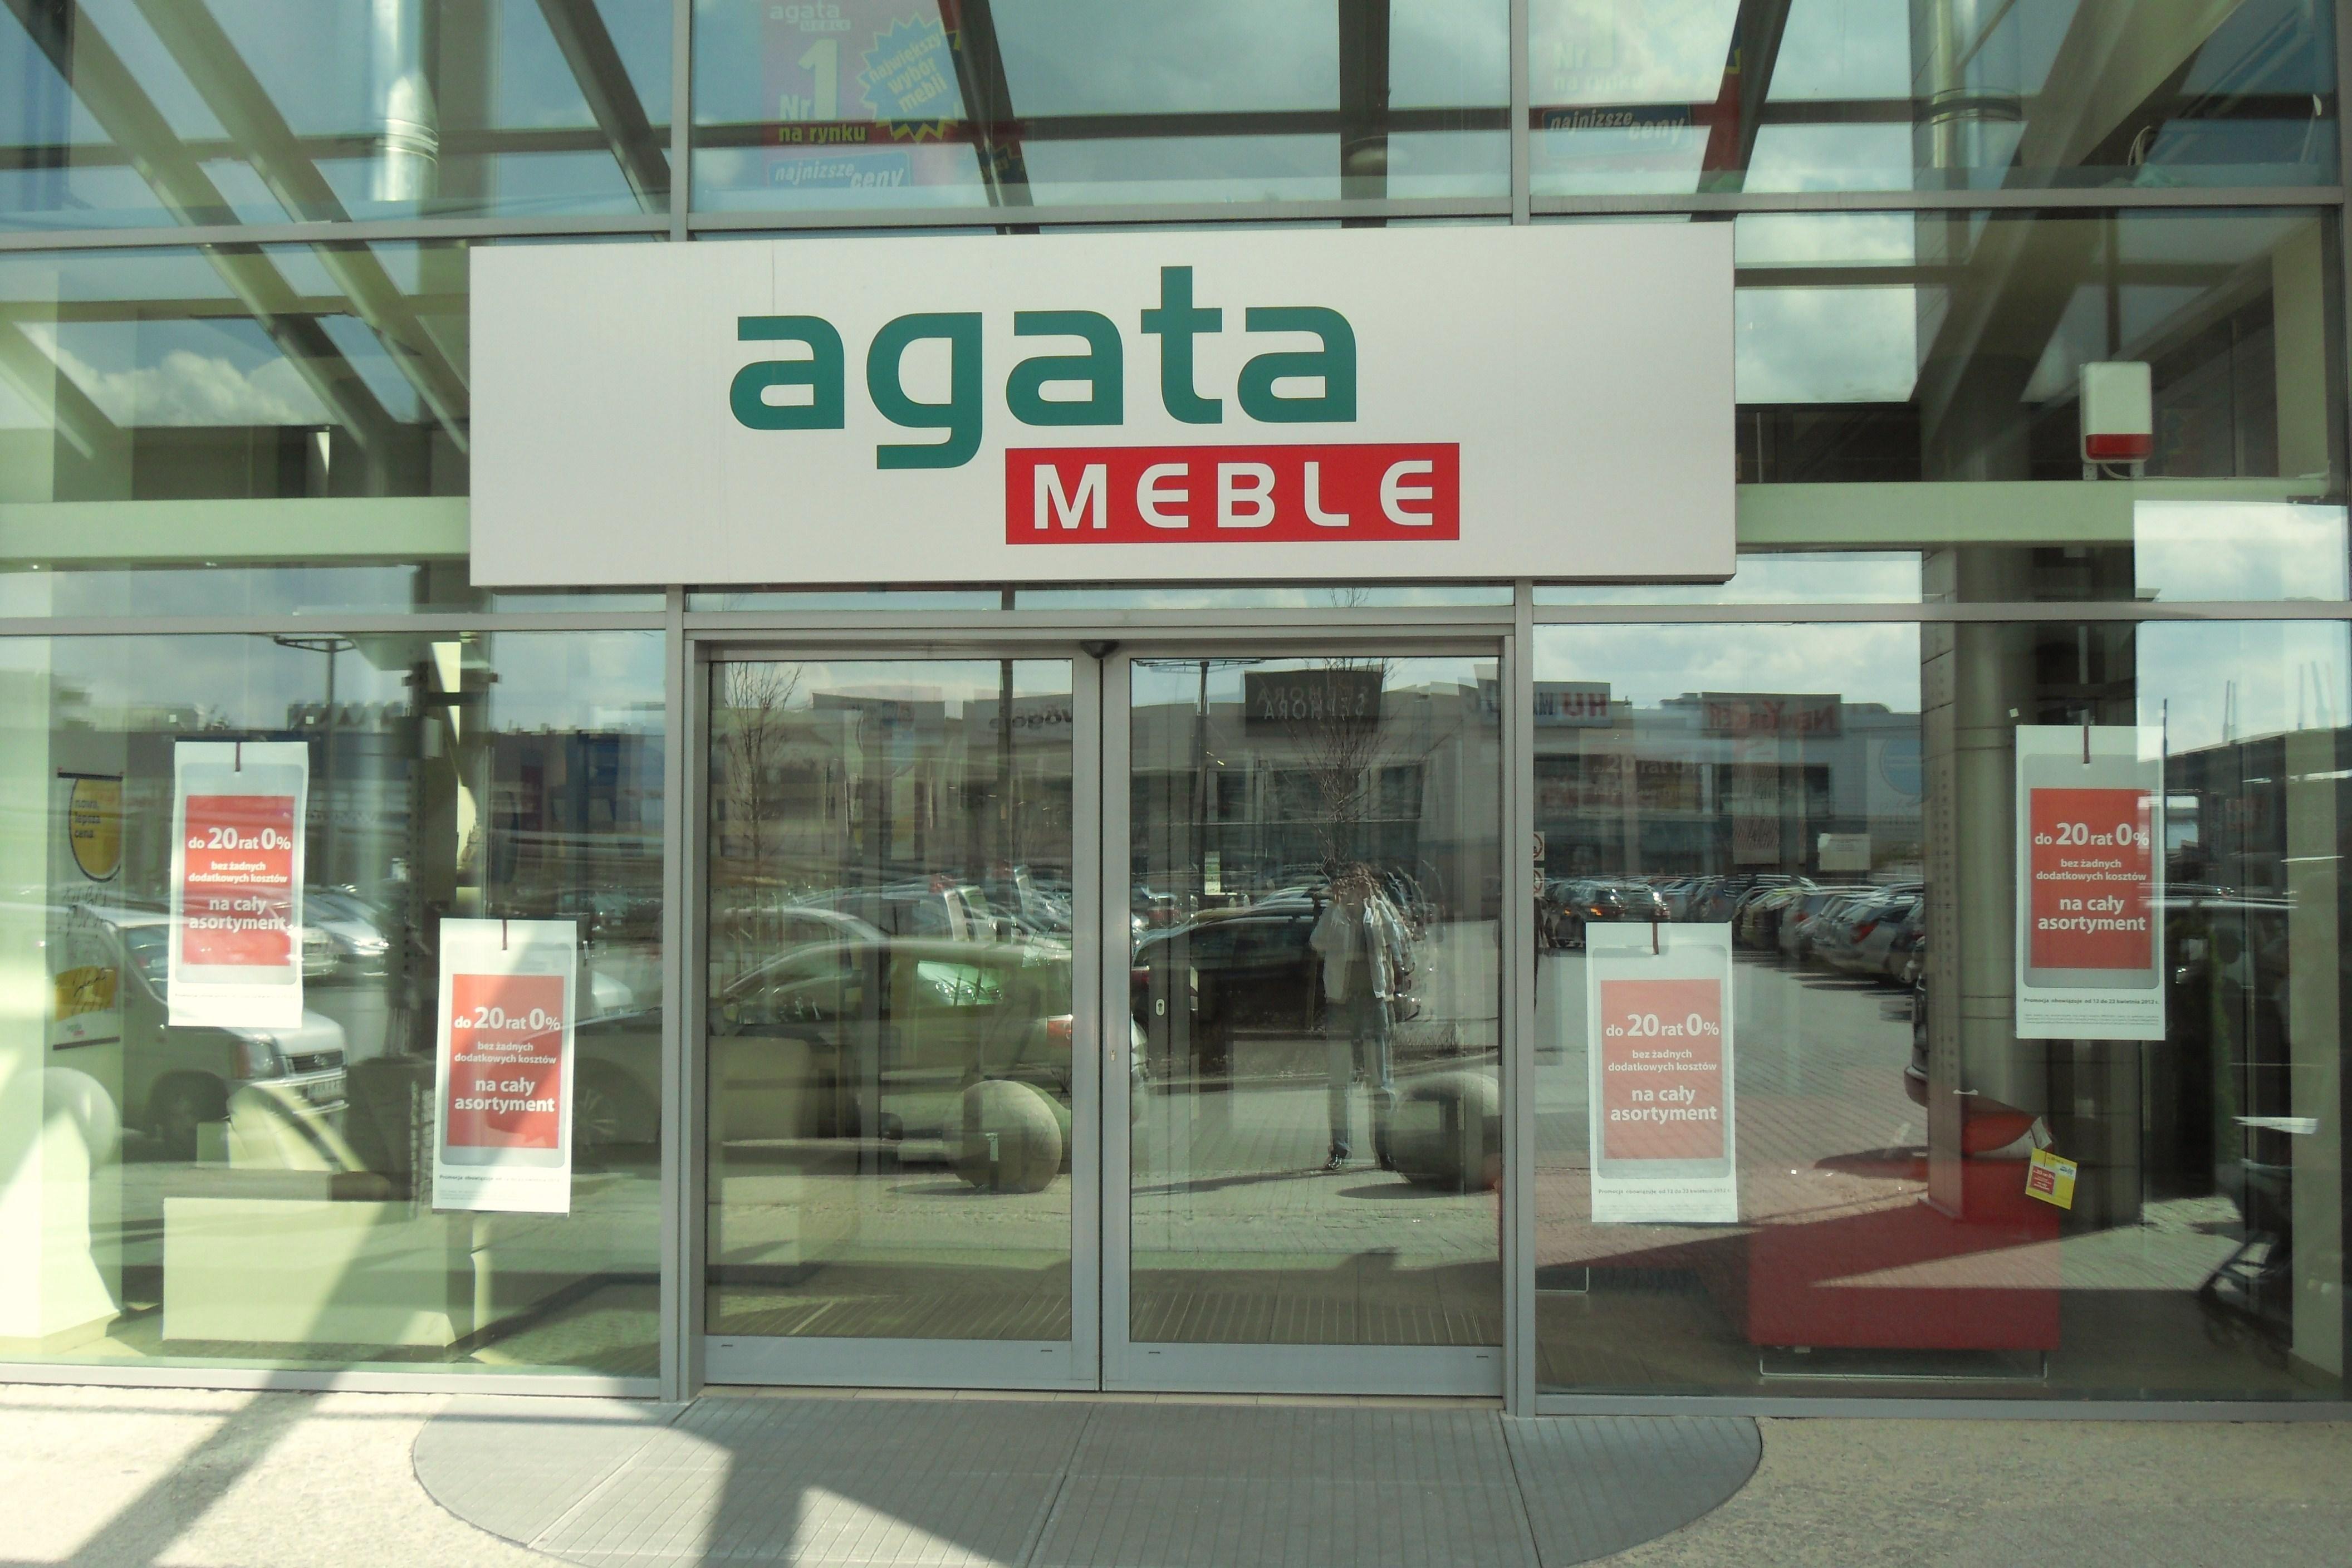 Plik Gdansk Park Handlowy Matarnia Sklep Agata Meble Jpg